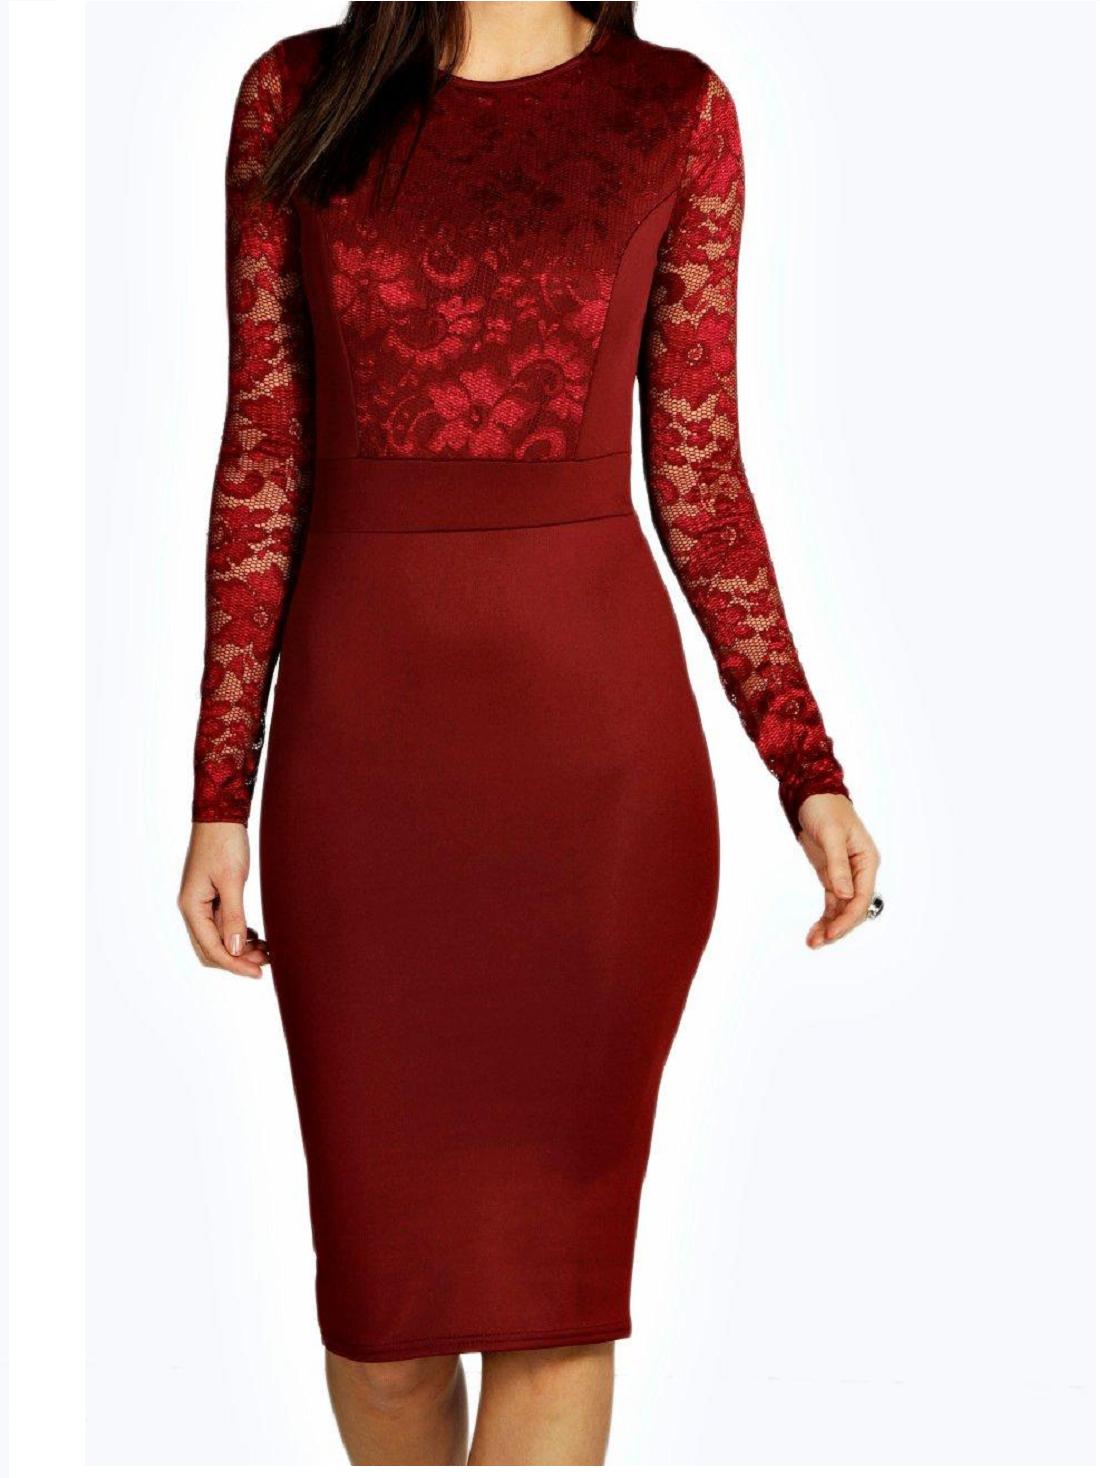 8 Wholesale Bodycon Long Sleeve Dresses